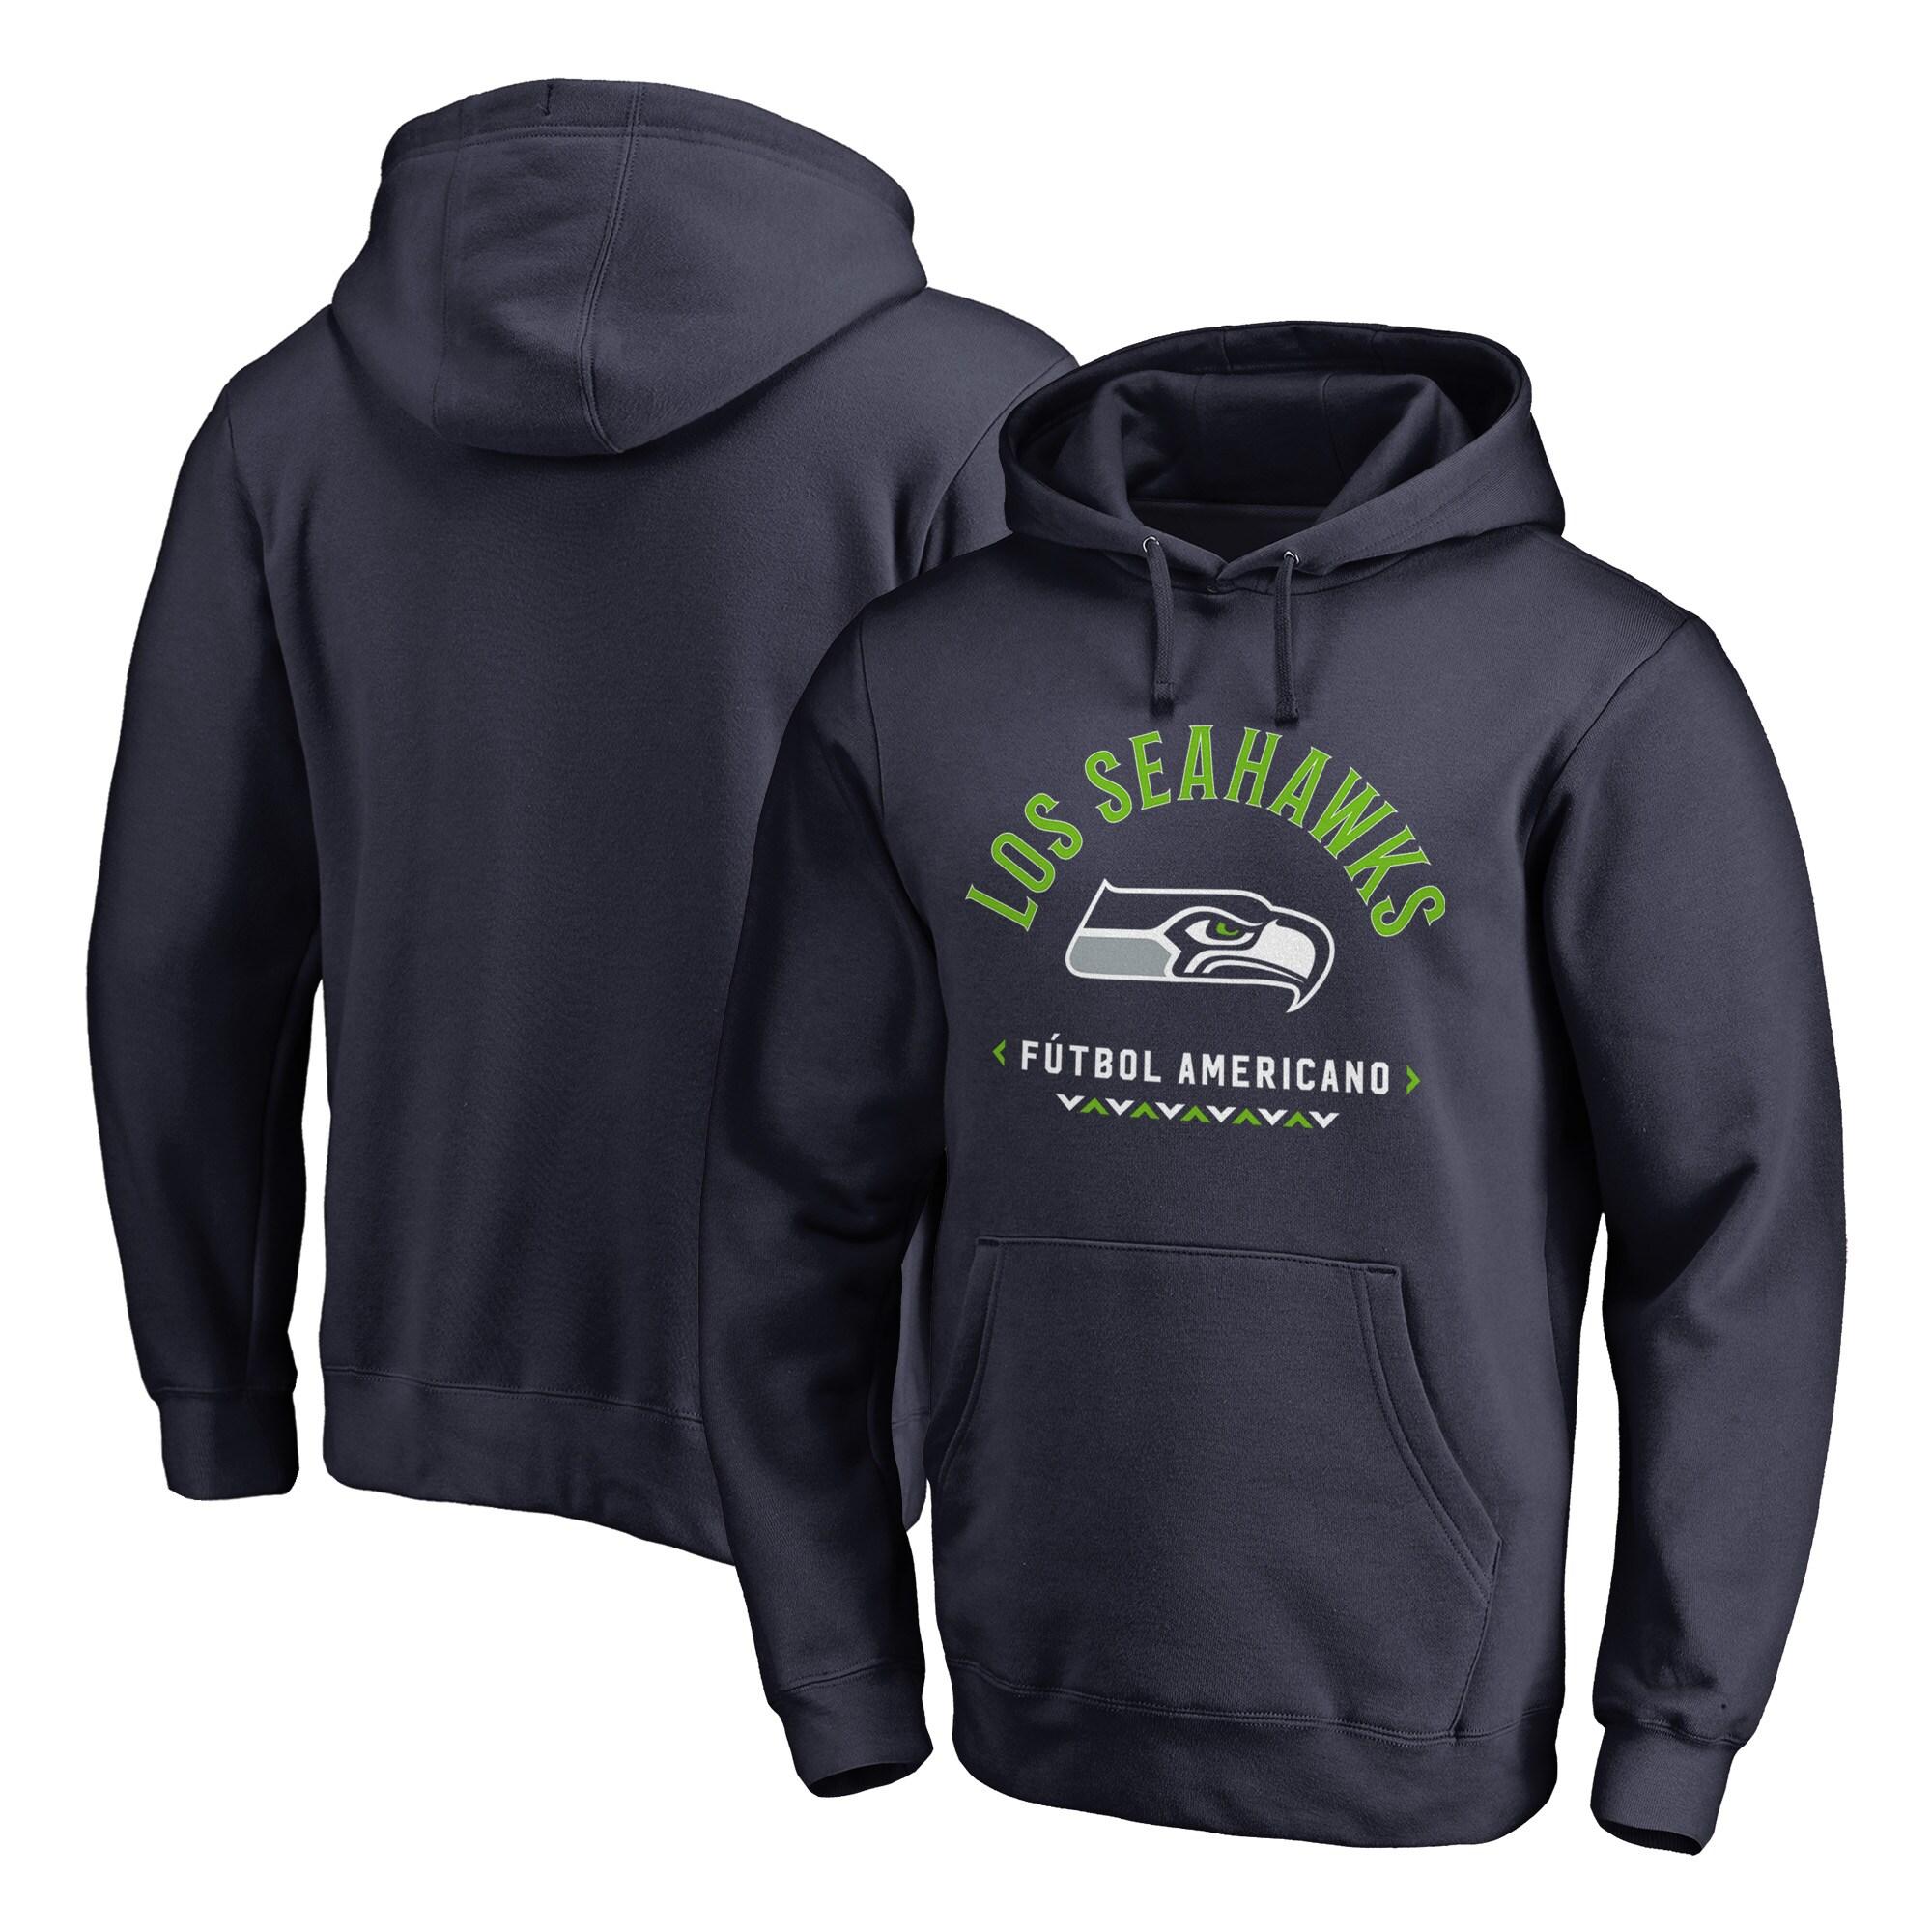 Seattle Seahawks NFL Pro Line by Fanatics Branded Futbol Americano Pullover Hoodie - College Navy